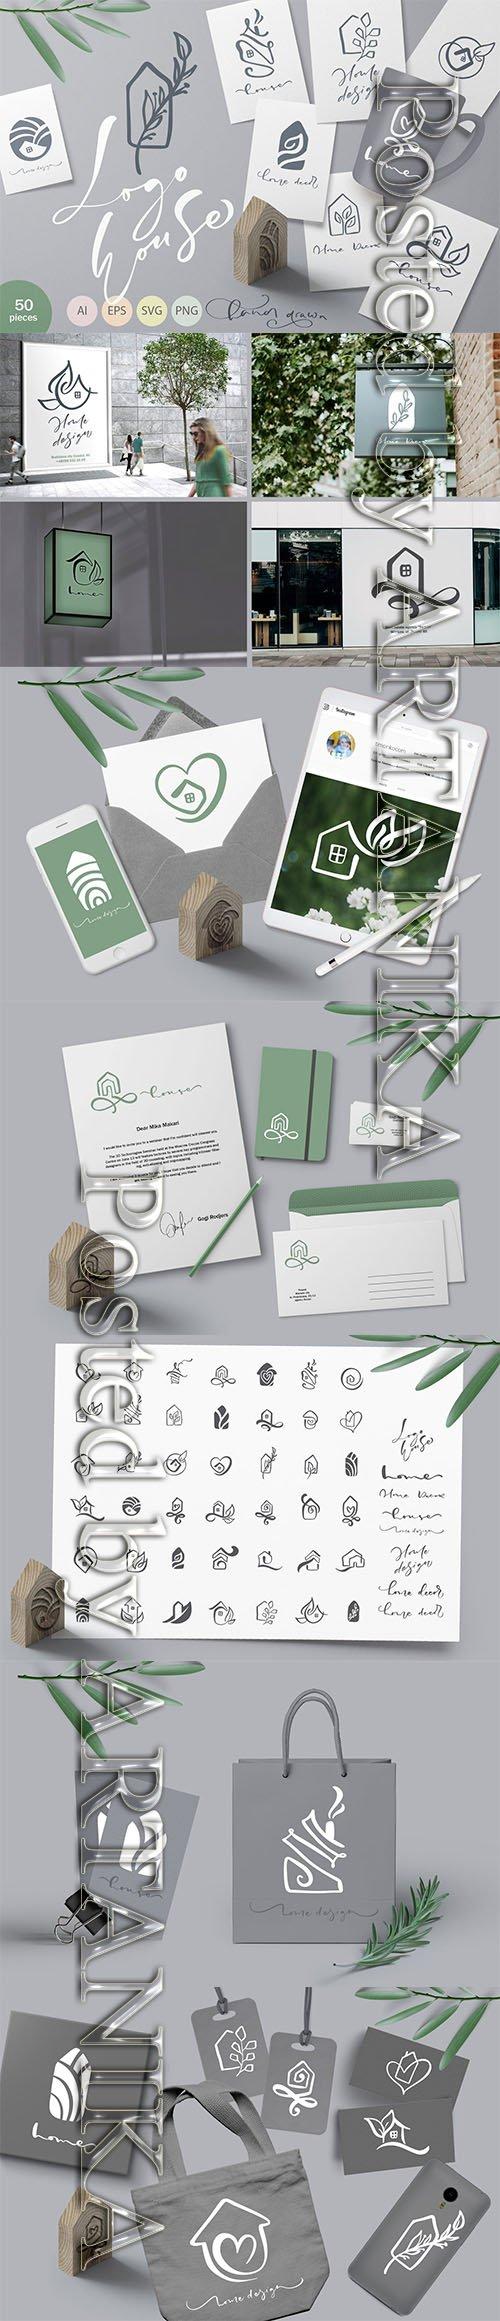 Hand drawn Logo House Vector elements SVG